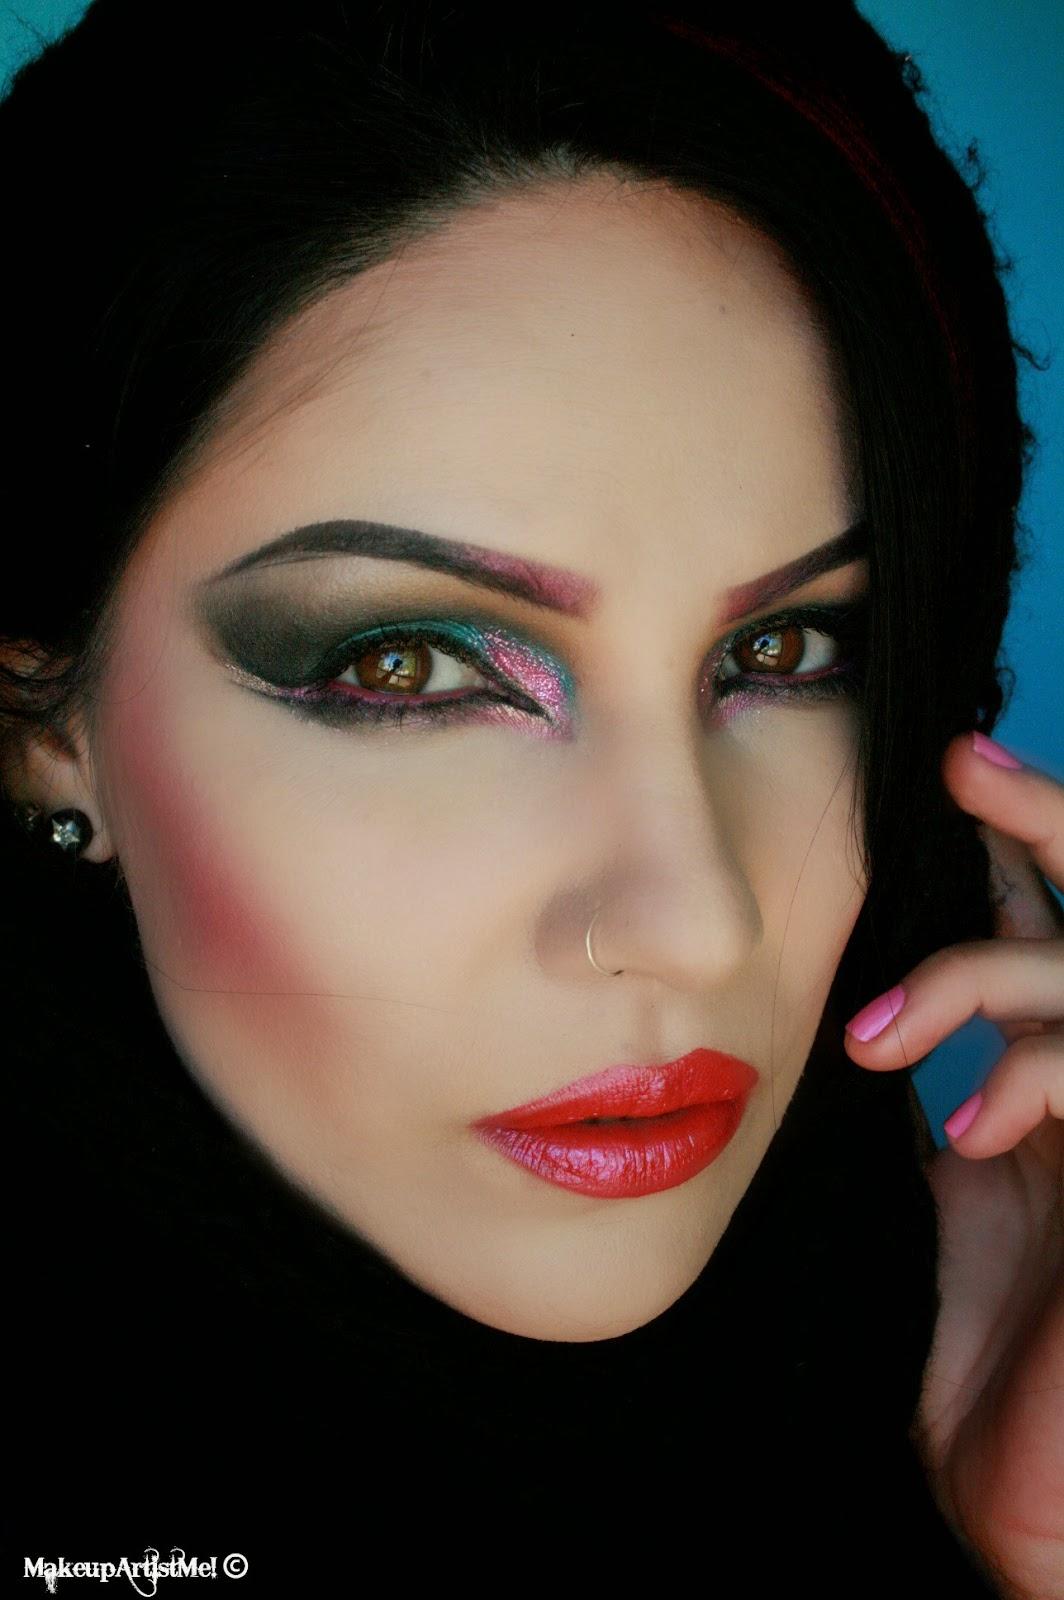 Makeup Artist Youtube: Make-up Artist Me!: Arabic Drama